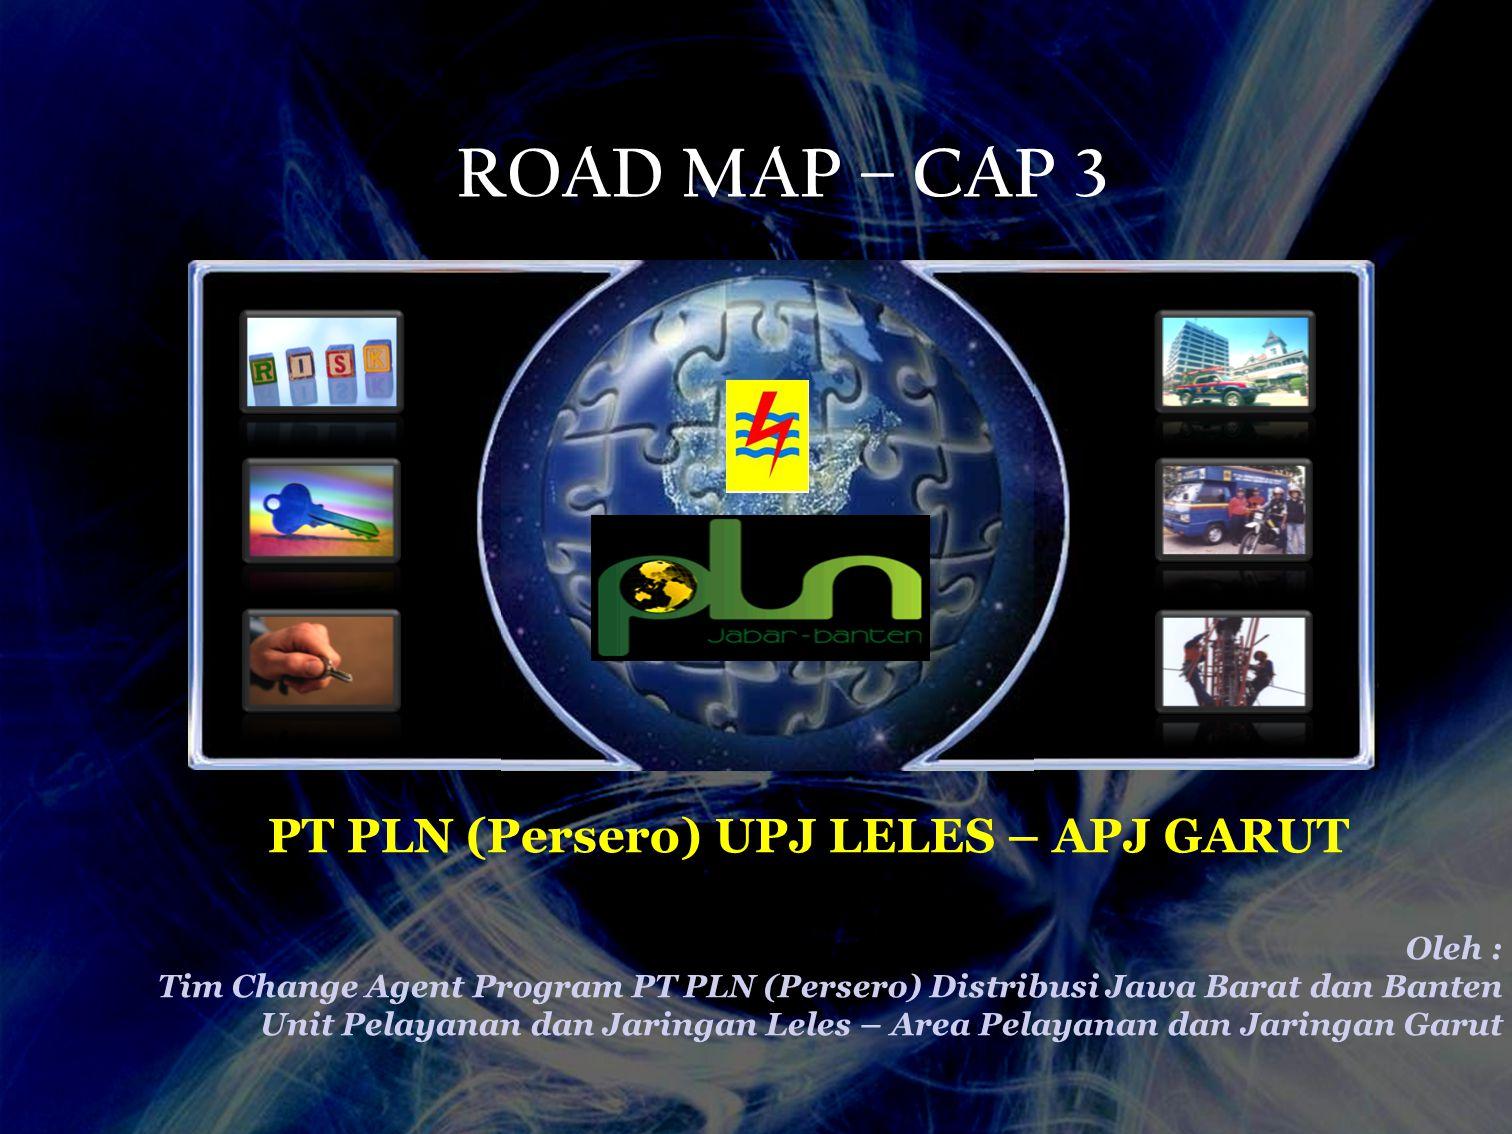 ROAD MAP – CAP 3 PT PLN (Persero) UPJ LELES – APJ GARUT Oleh : Tim Change Agent Program PT PLN (Persero) Distribusi Jawa Barat dan Banten Unit Pelayan